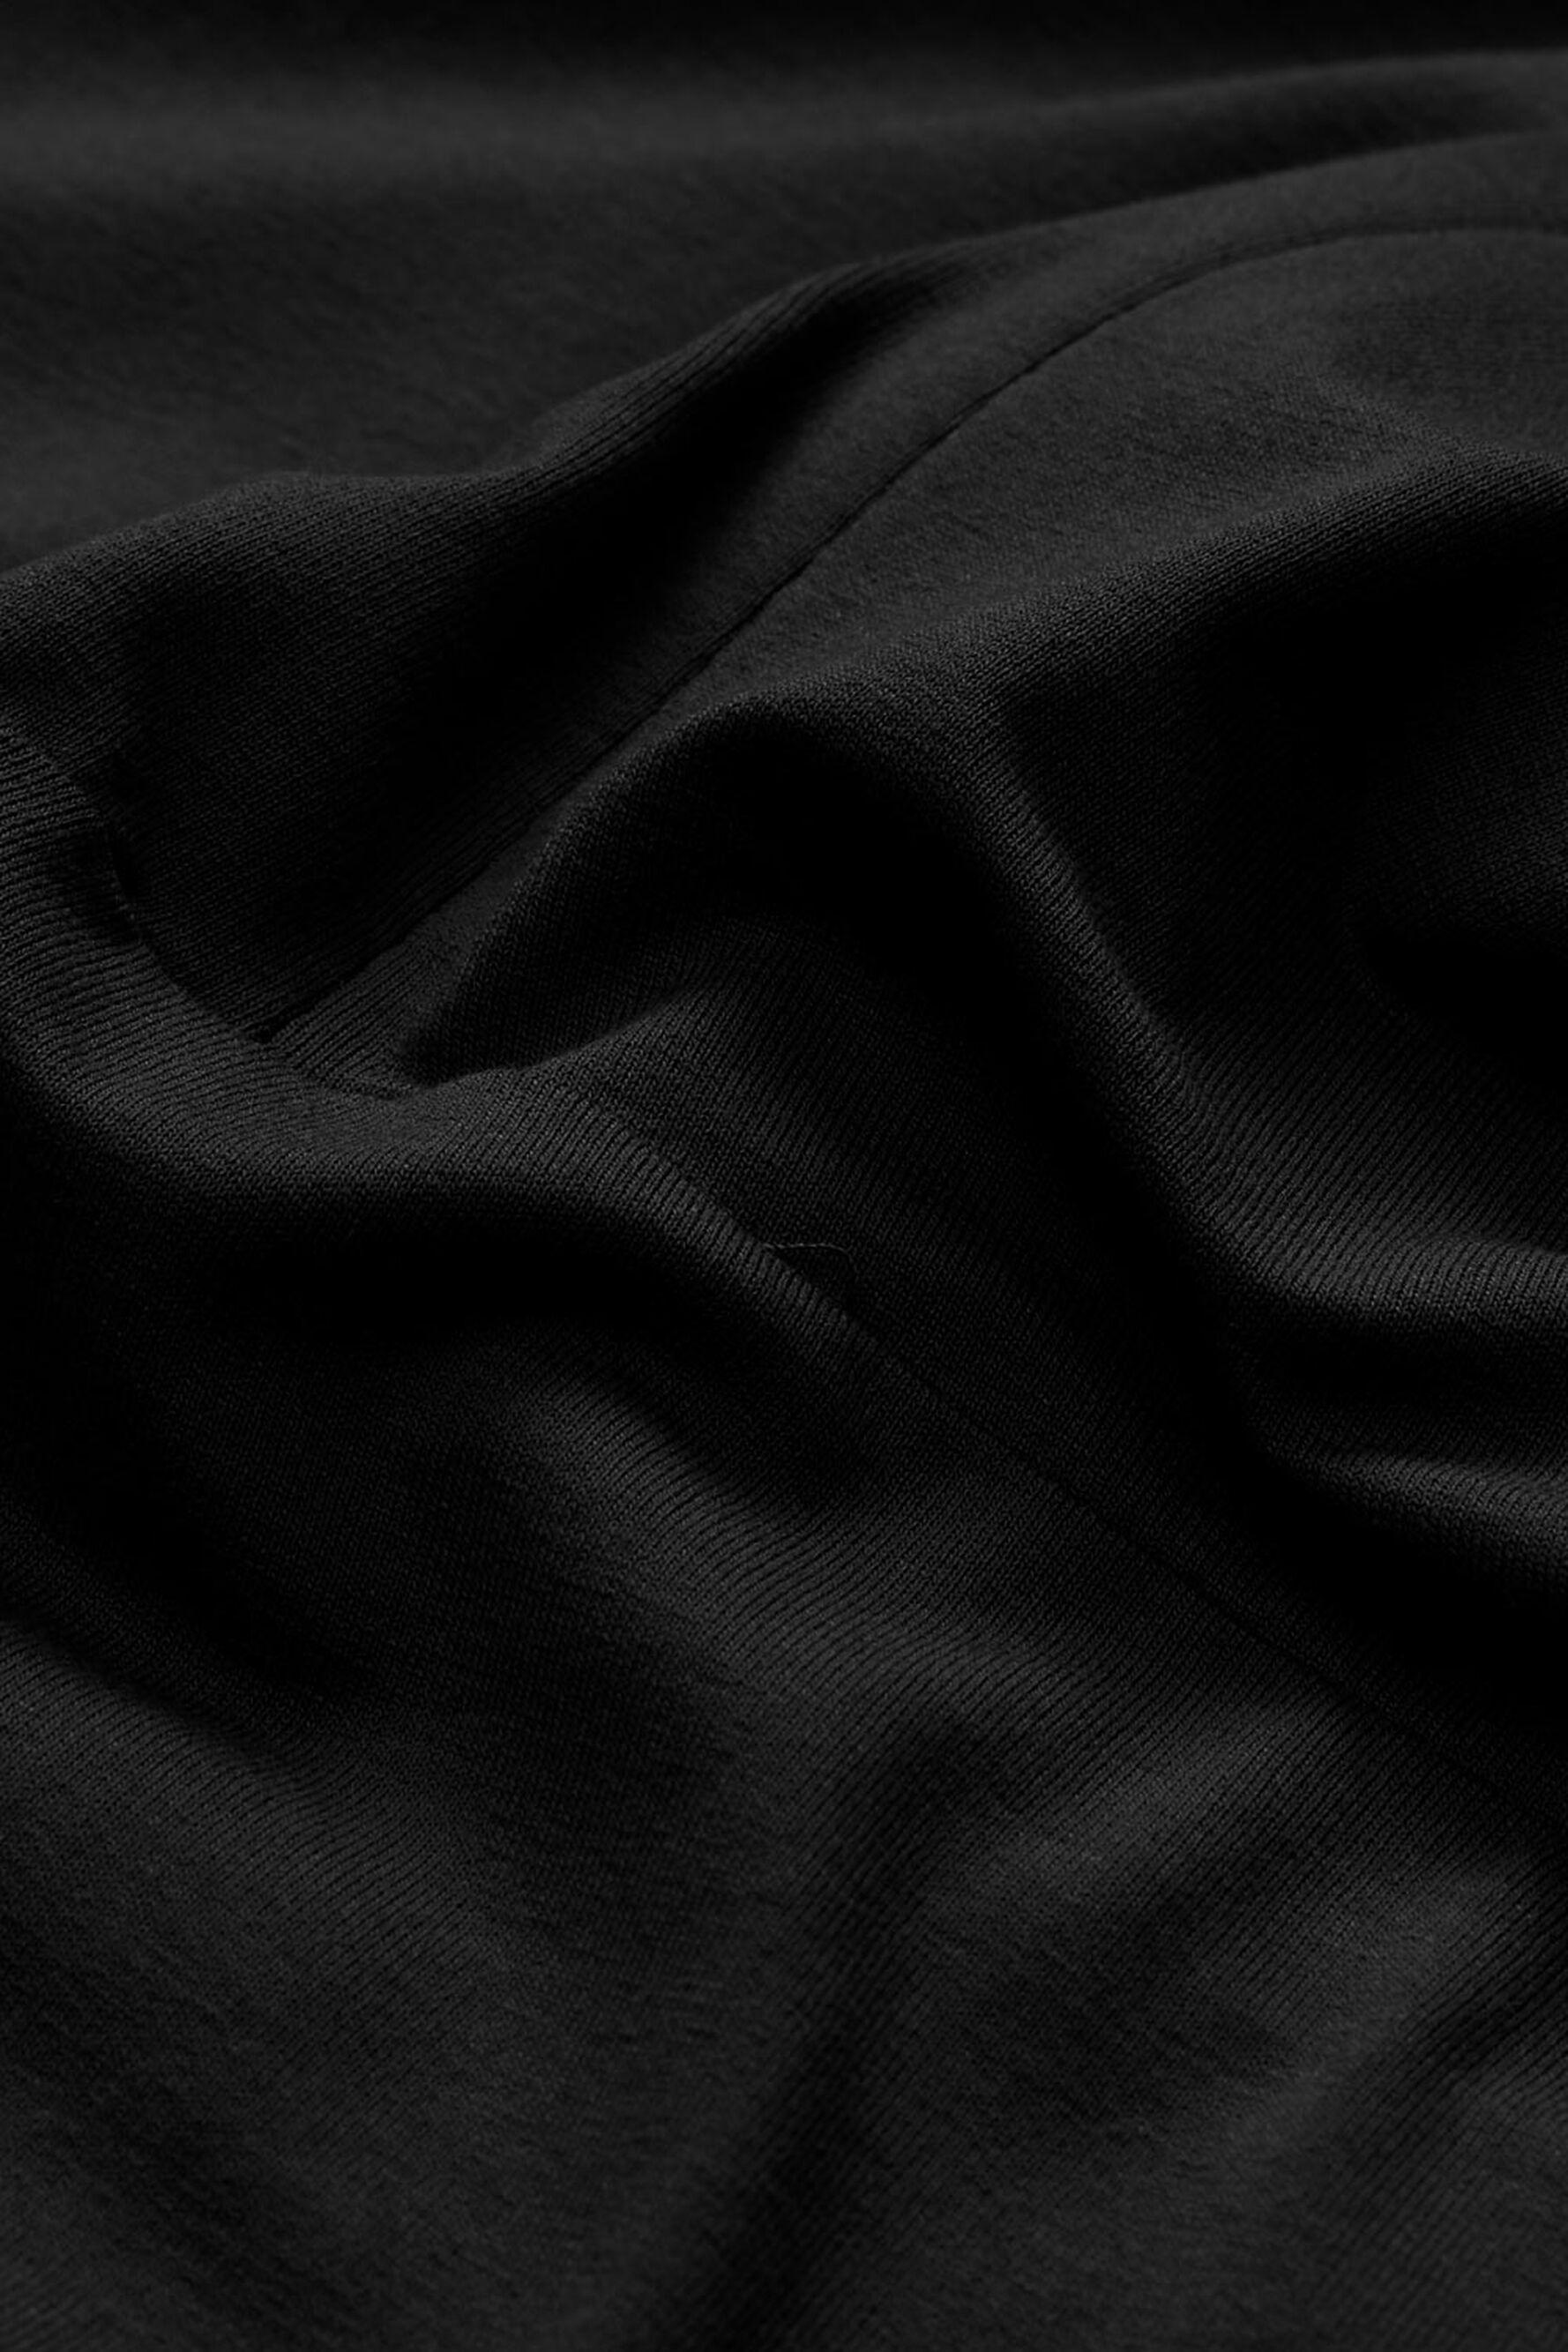 NABSA DRESS, Black, hi-res